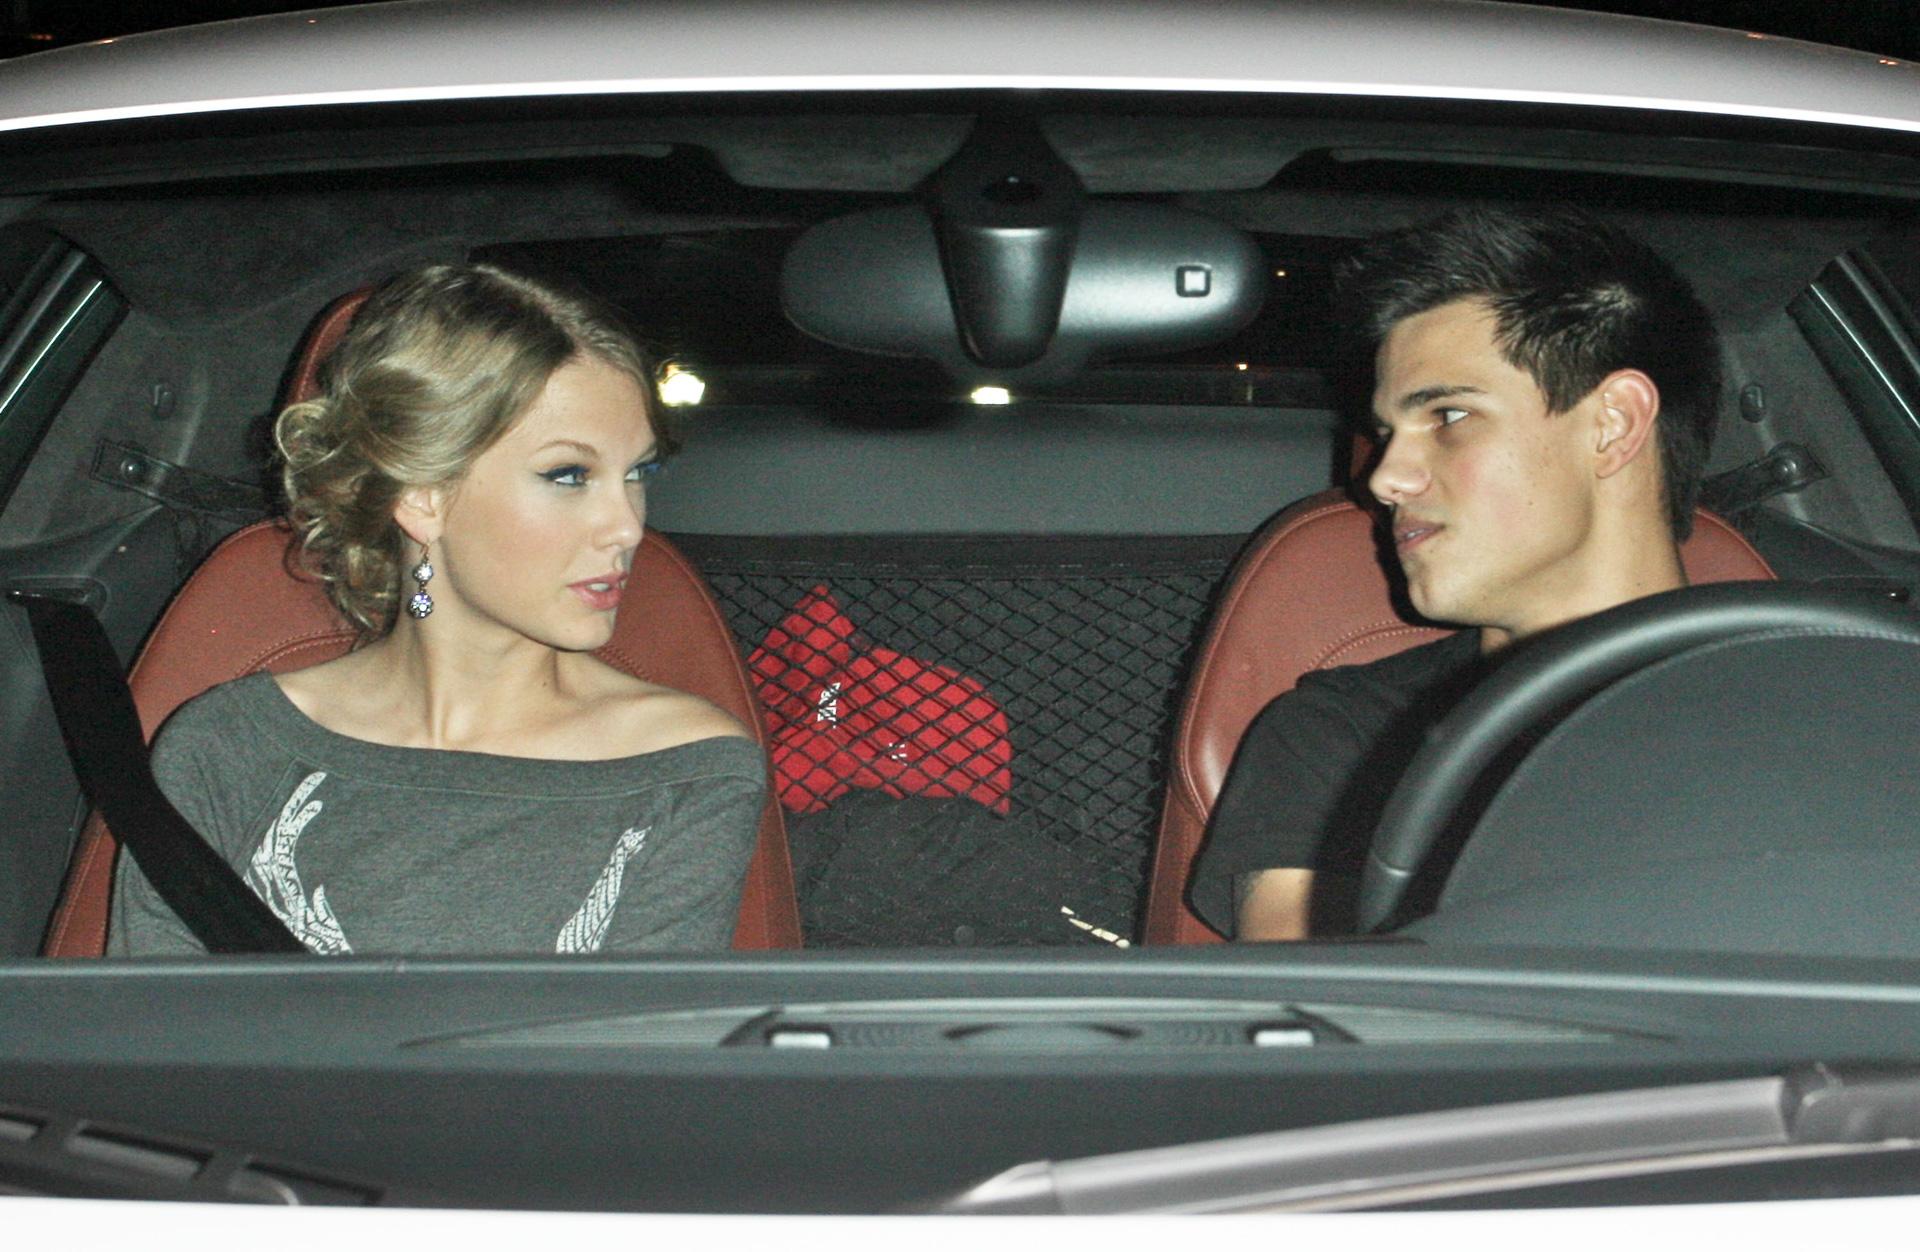 Tayor Swift and Taylor Lautner